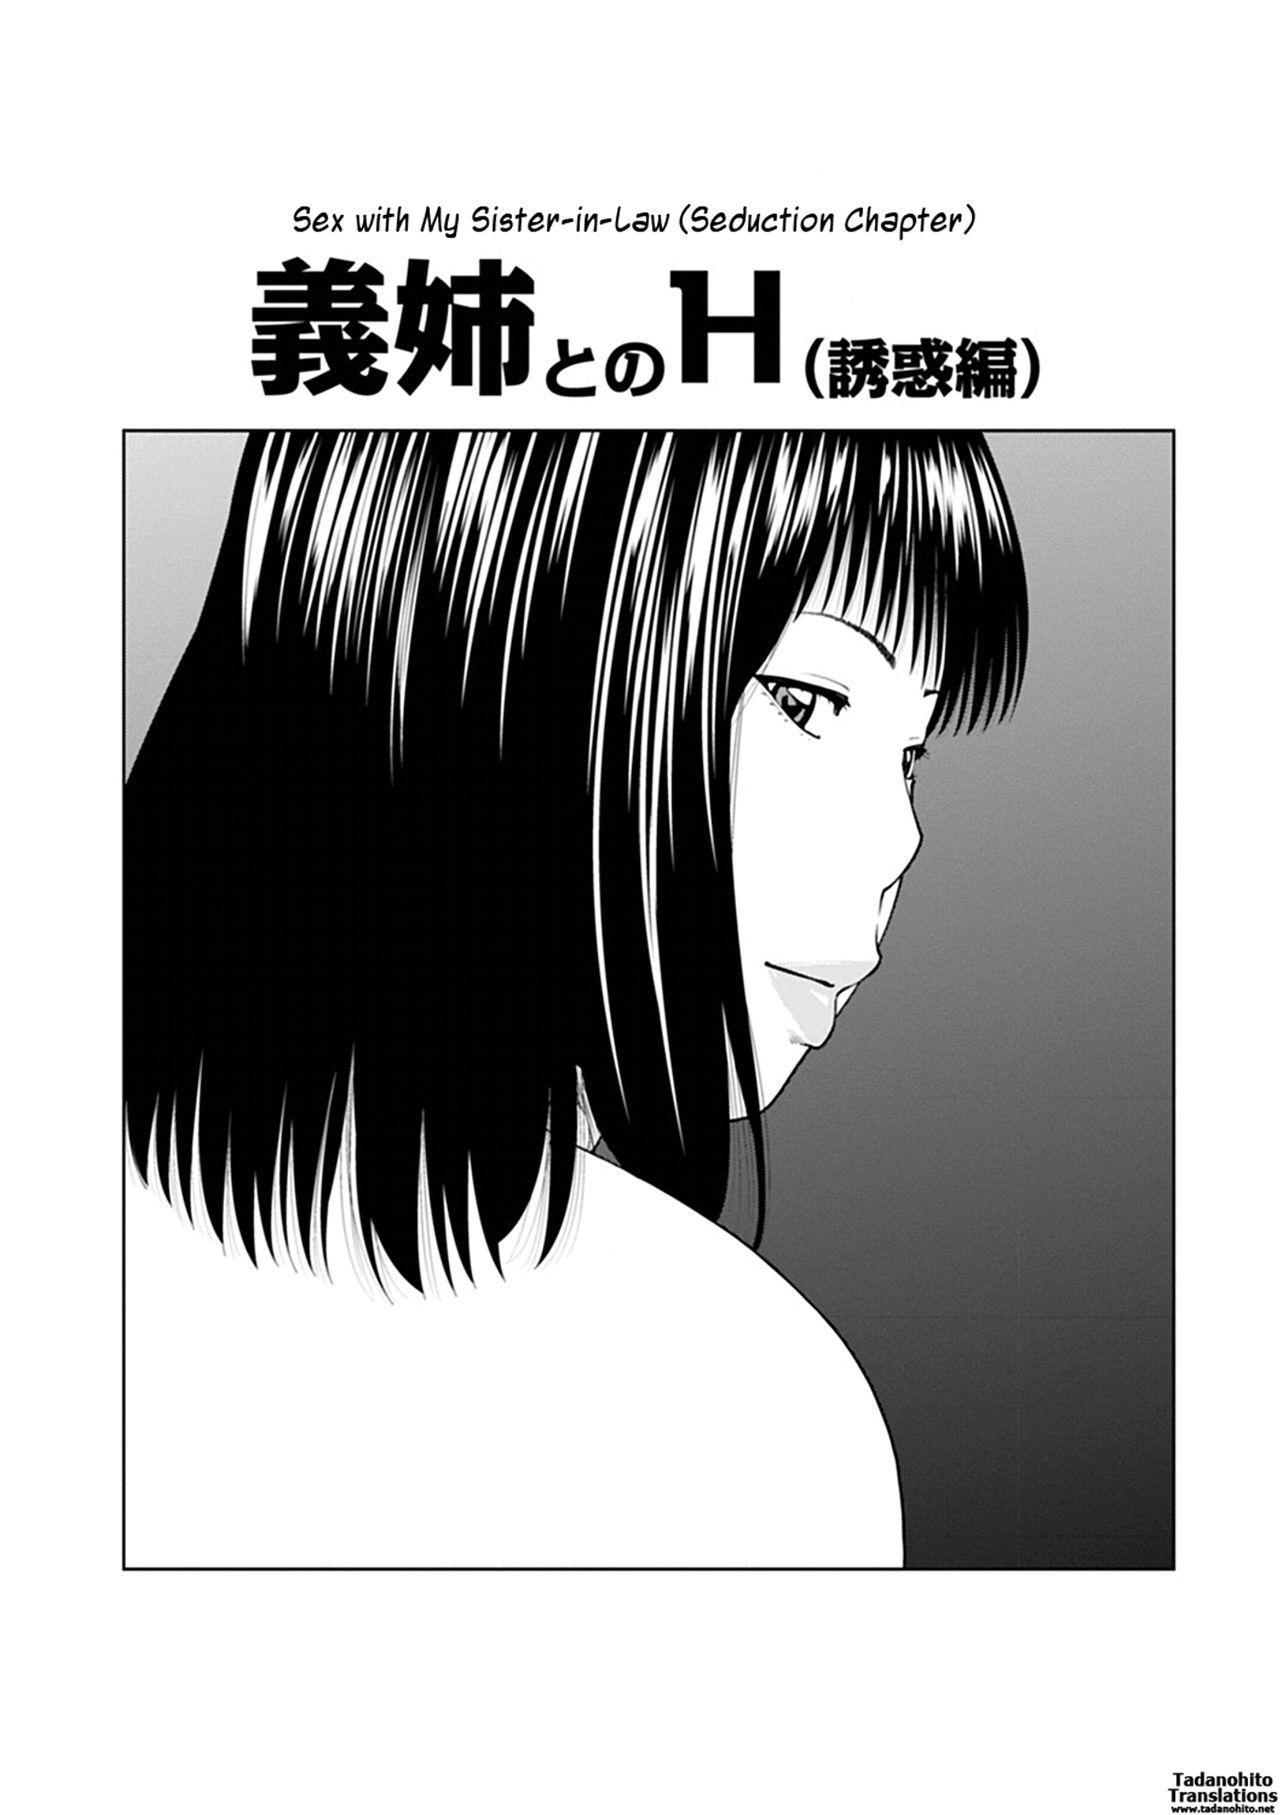 [Kuroki Hidehiko] 36-sai Injuku Sakarizuma | 36-Year-Old Randy Mature Wife [English] {Tadanohito} [Digital] [Uncensored] 38